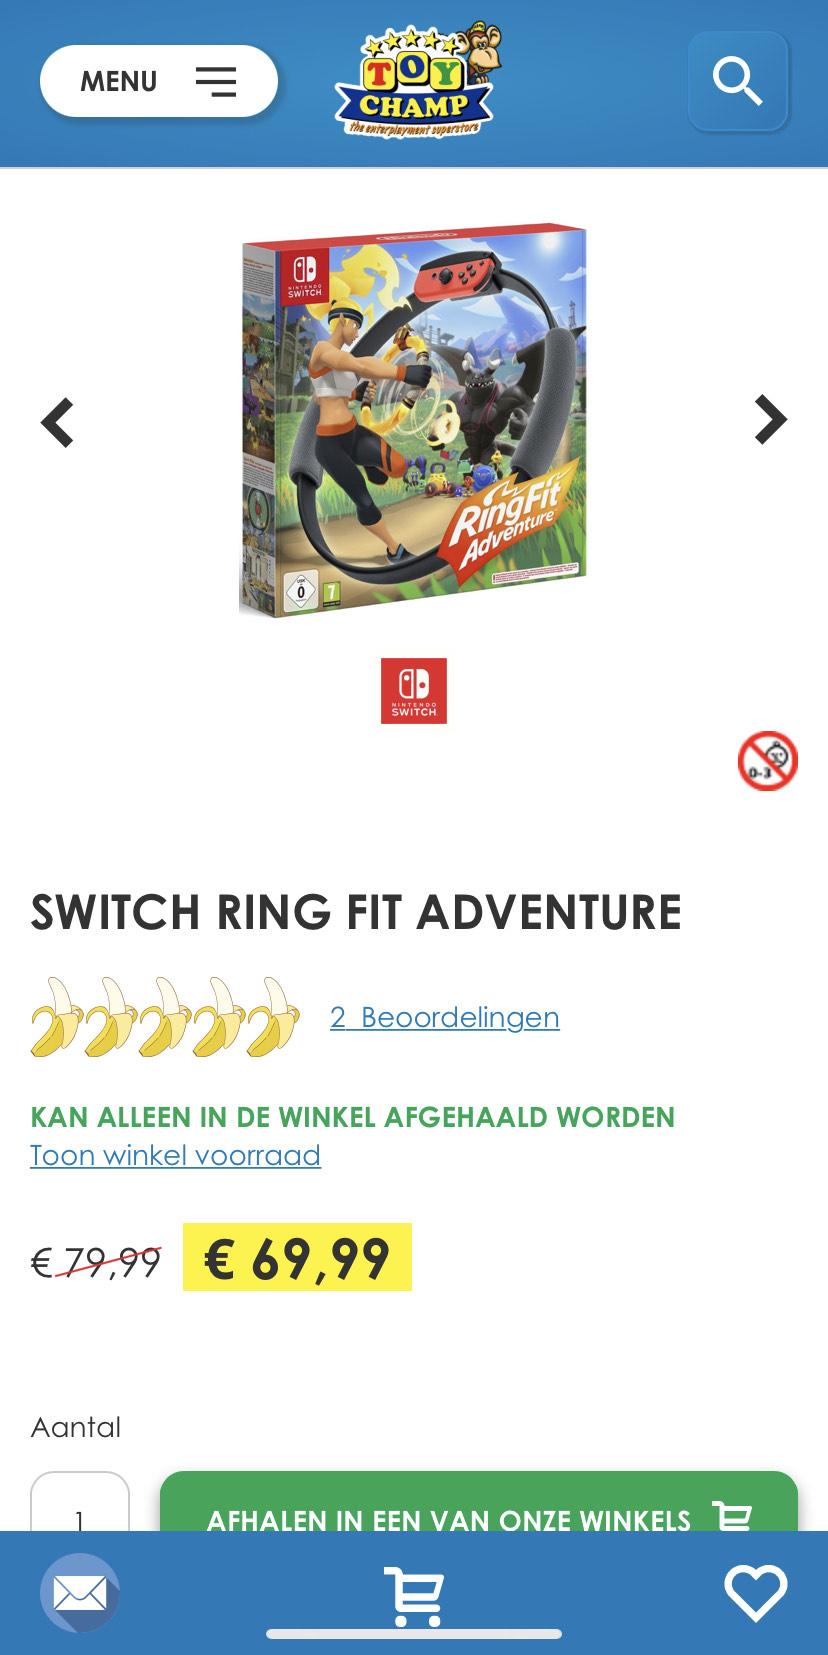 [Winkel] Switch Ring fit adventure